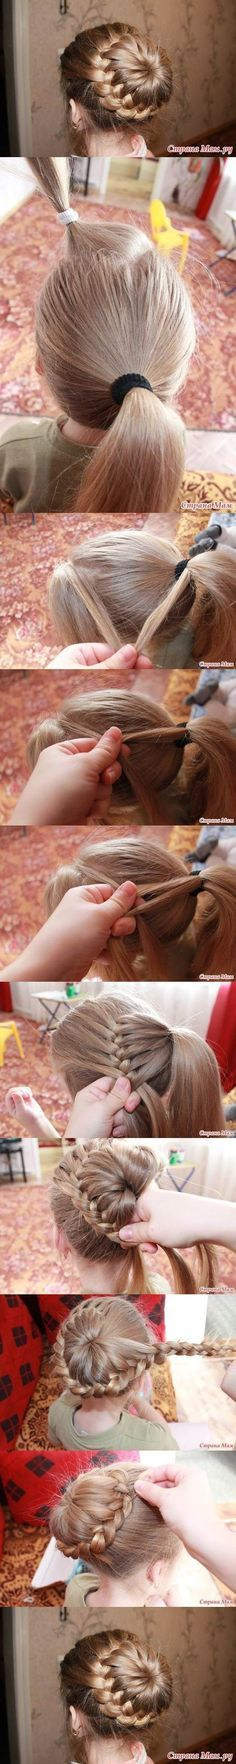 DIY Unique Braided Bun Hairstyle | iCreativeIdeas.com - http://1pic4u.com/2015/09/04/diy-unique-braided-bun-hairstyle-icreativeideas-com/